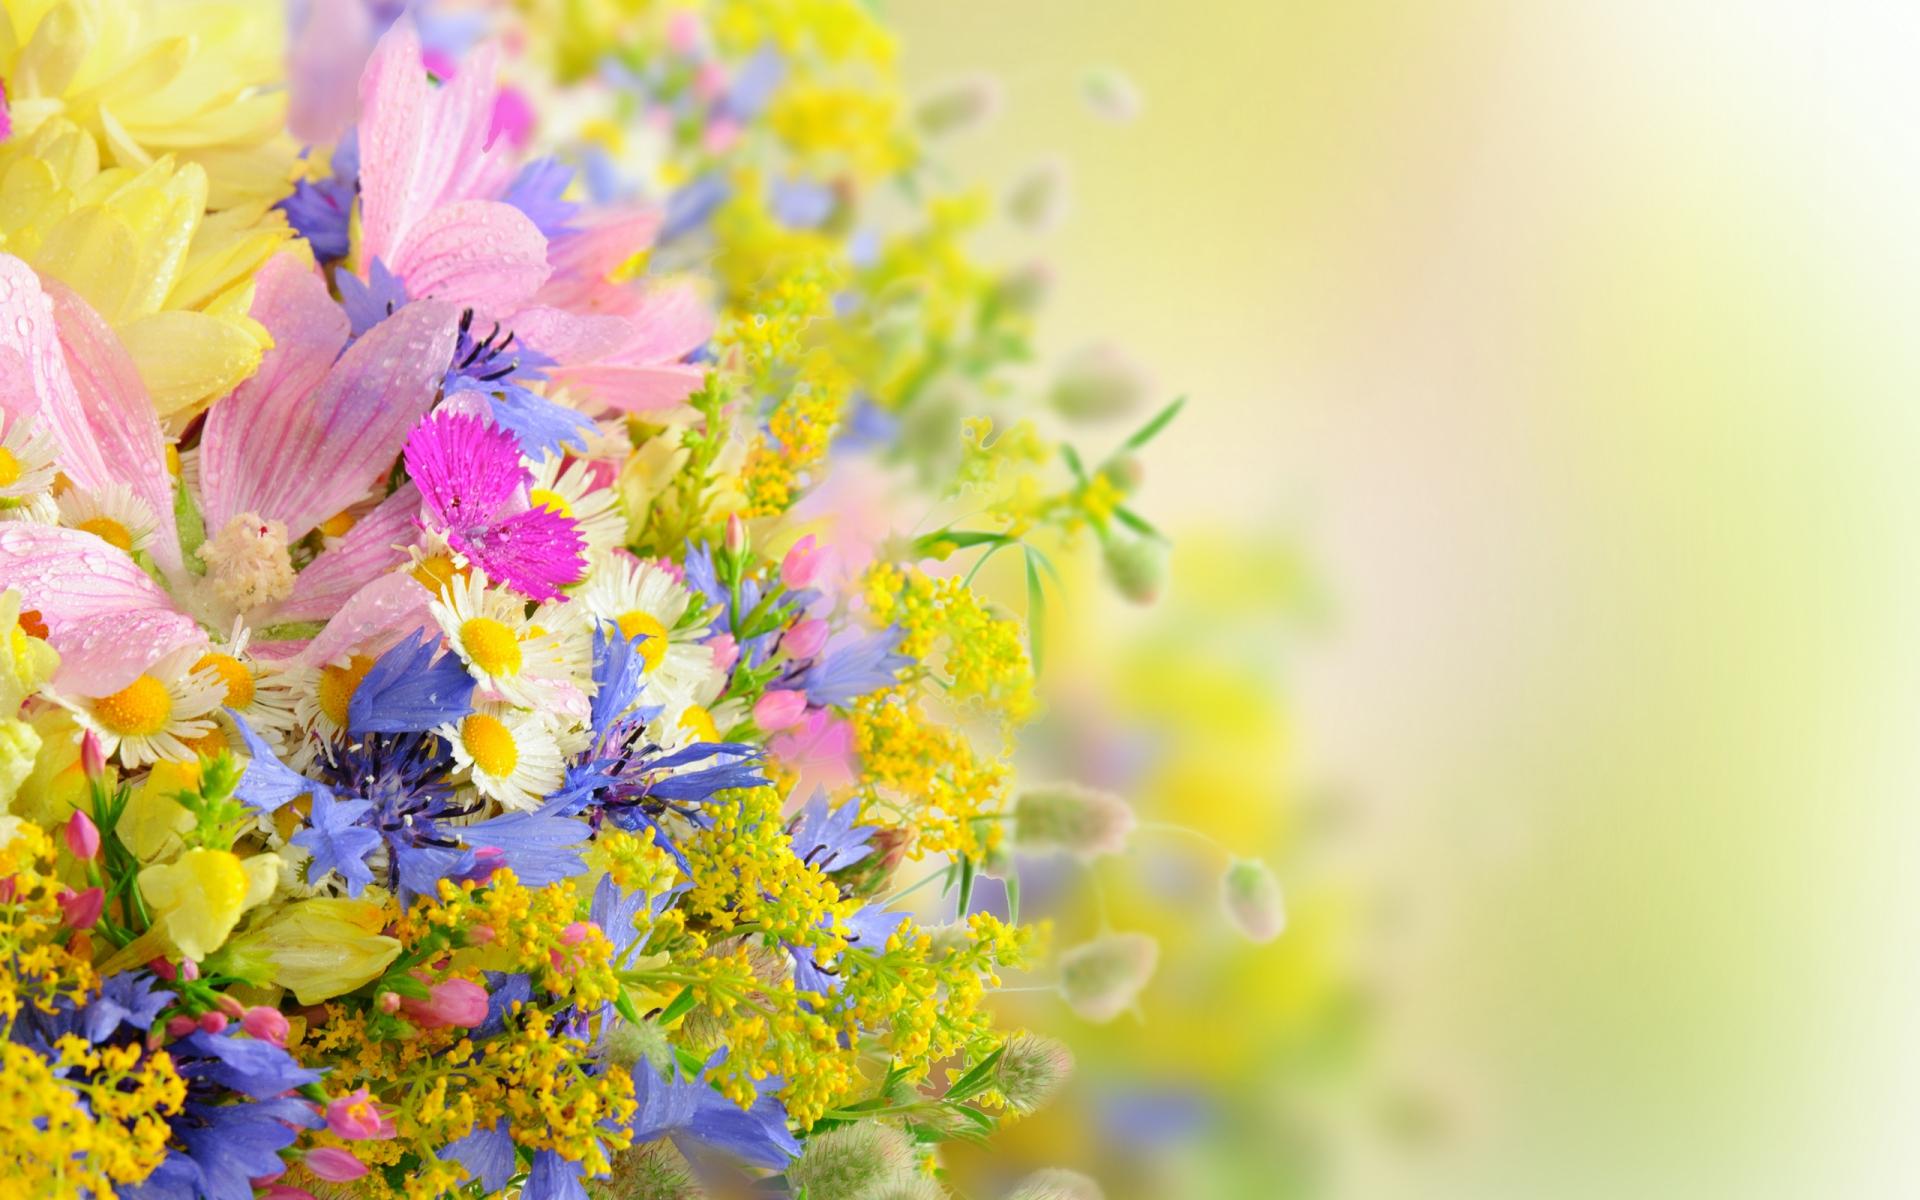 Flower Hd Wallpaper Background Image 1920x1200 Id 313731